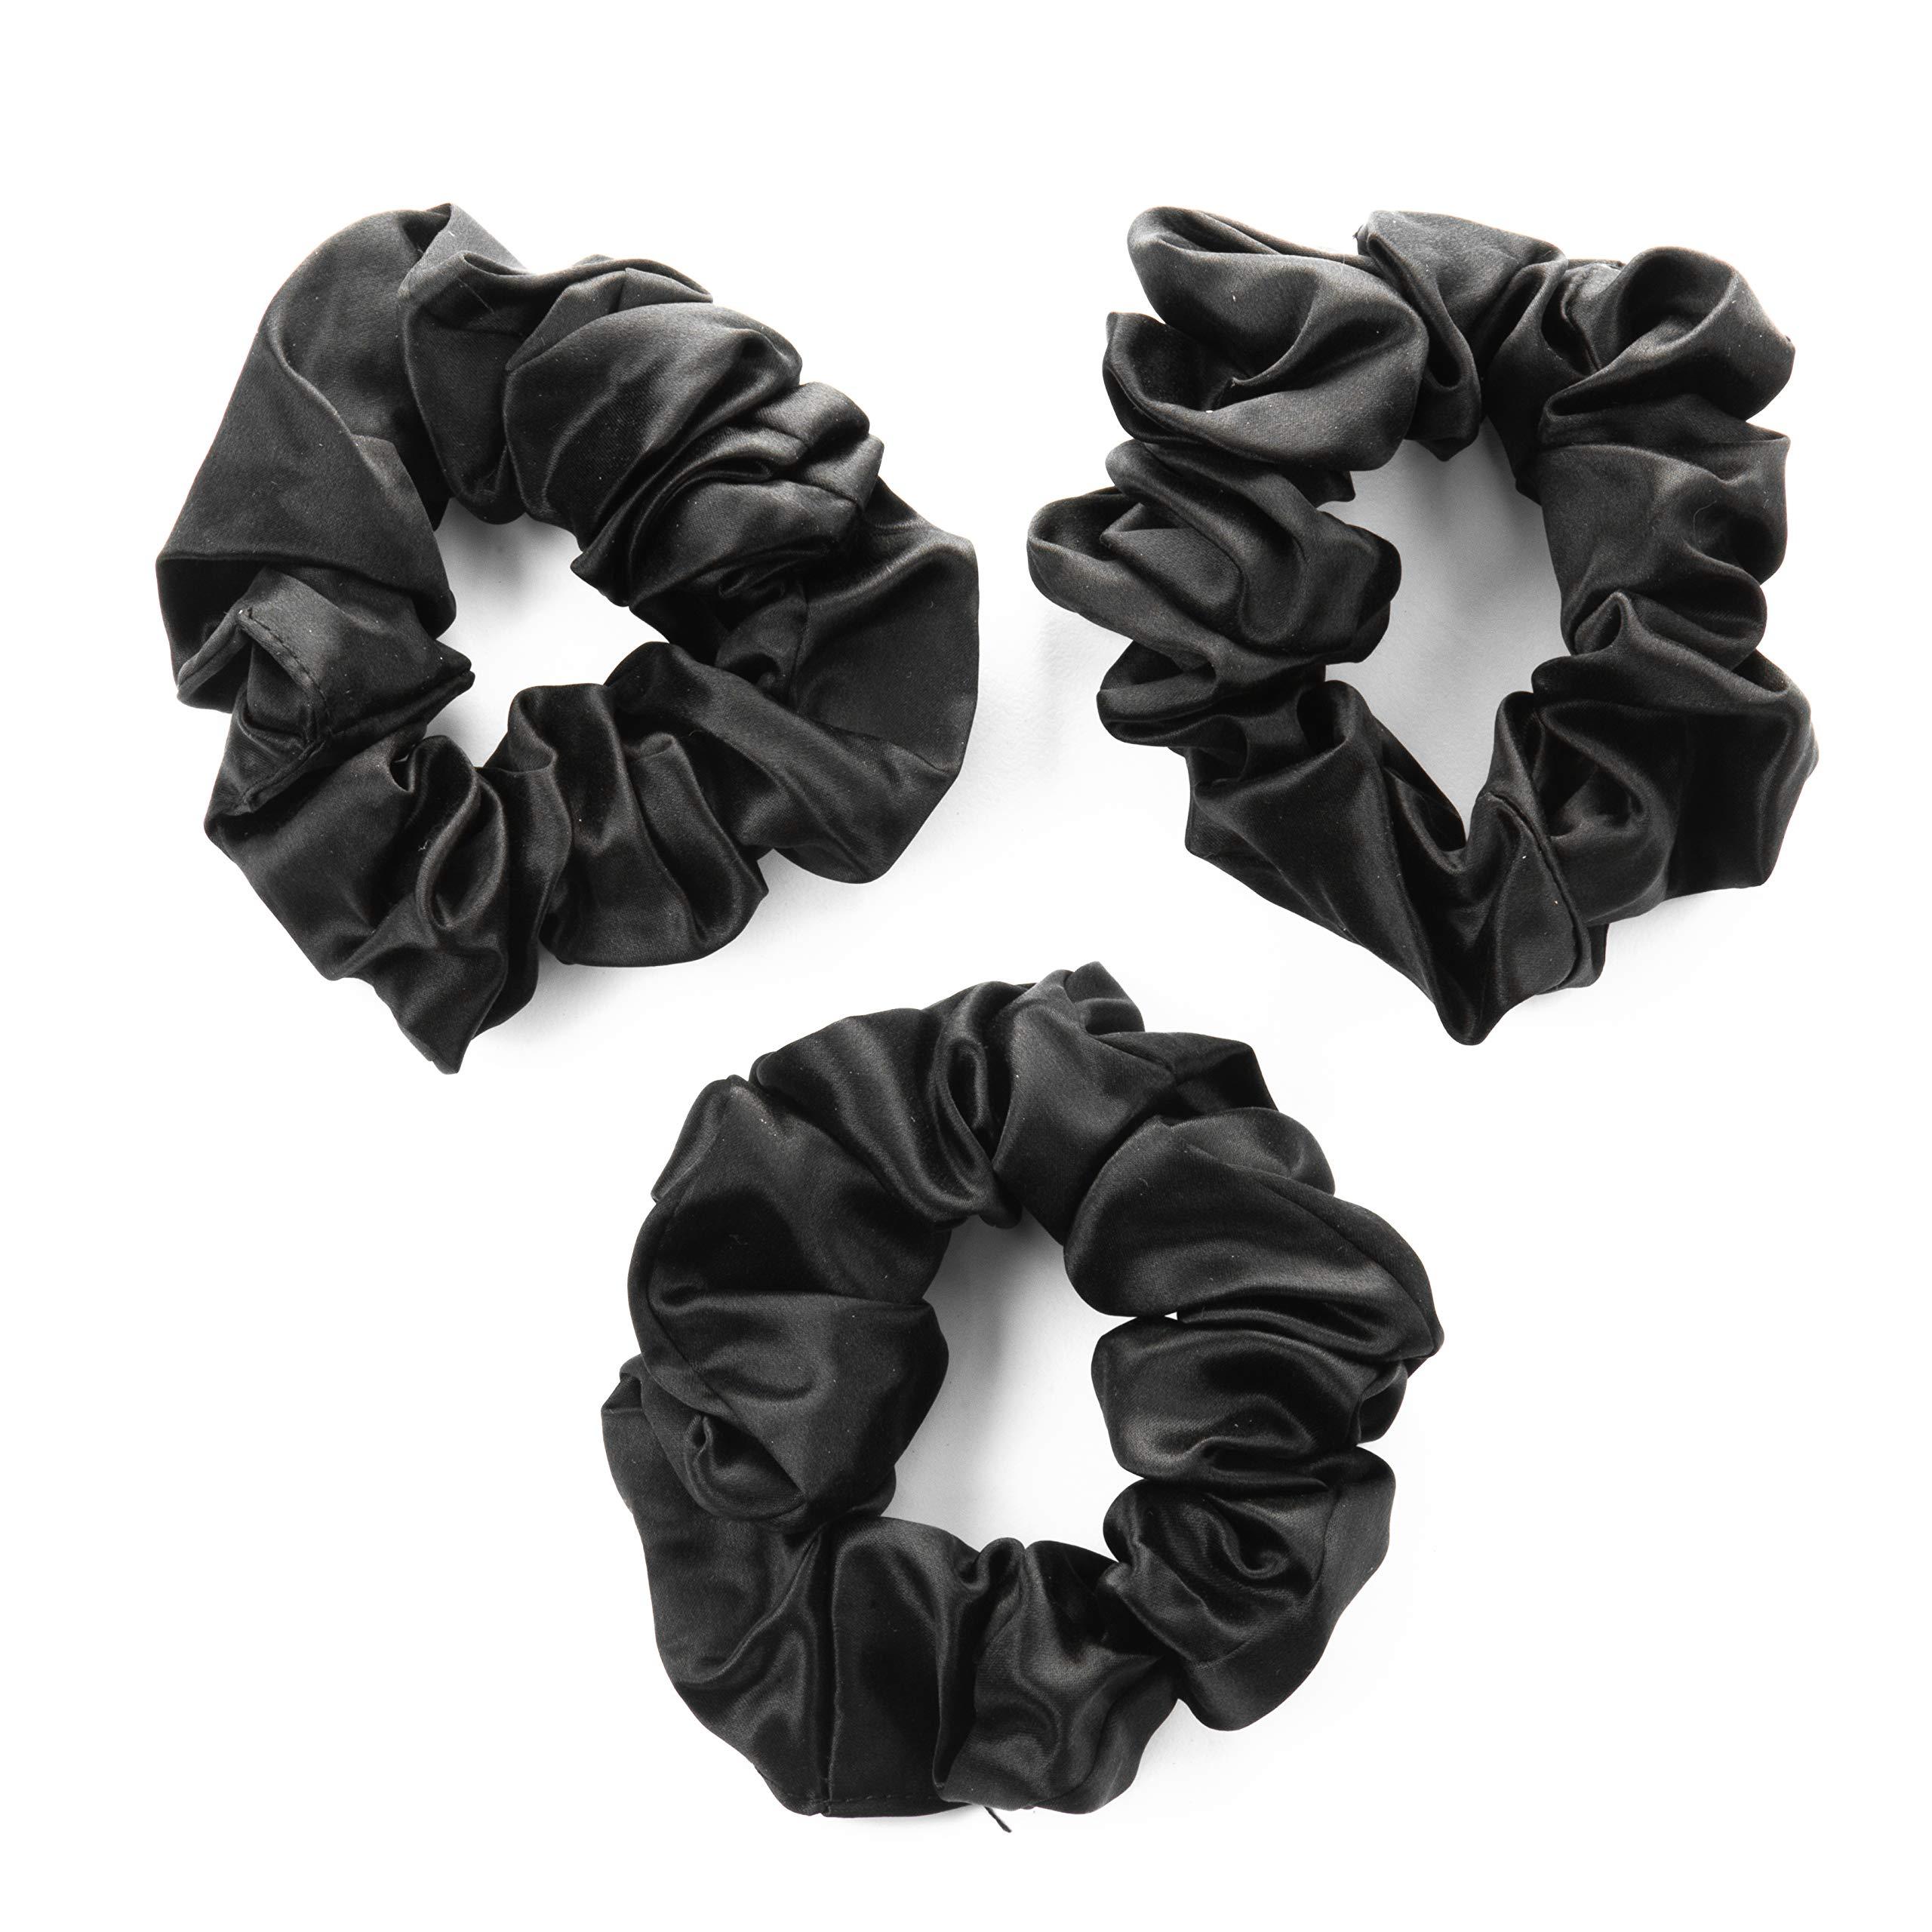 100% Premium Mulberry Silk Hair Luxe Scrunchies (Pack of 3 Black Hair Ties Per Box) by Hair Luxe